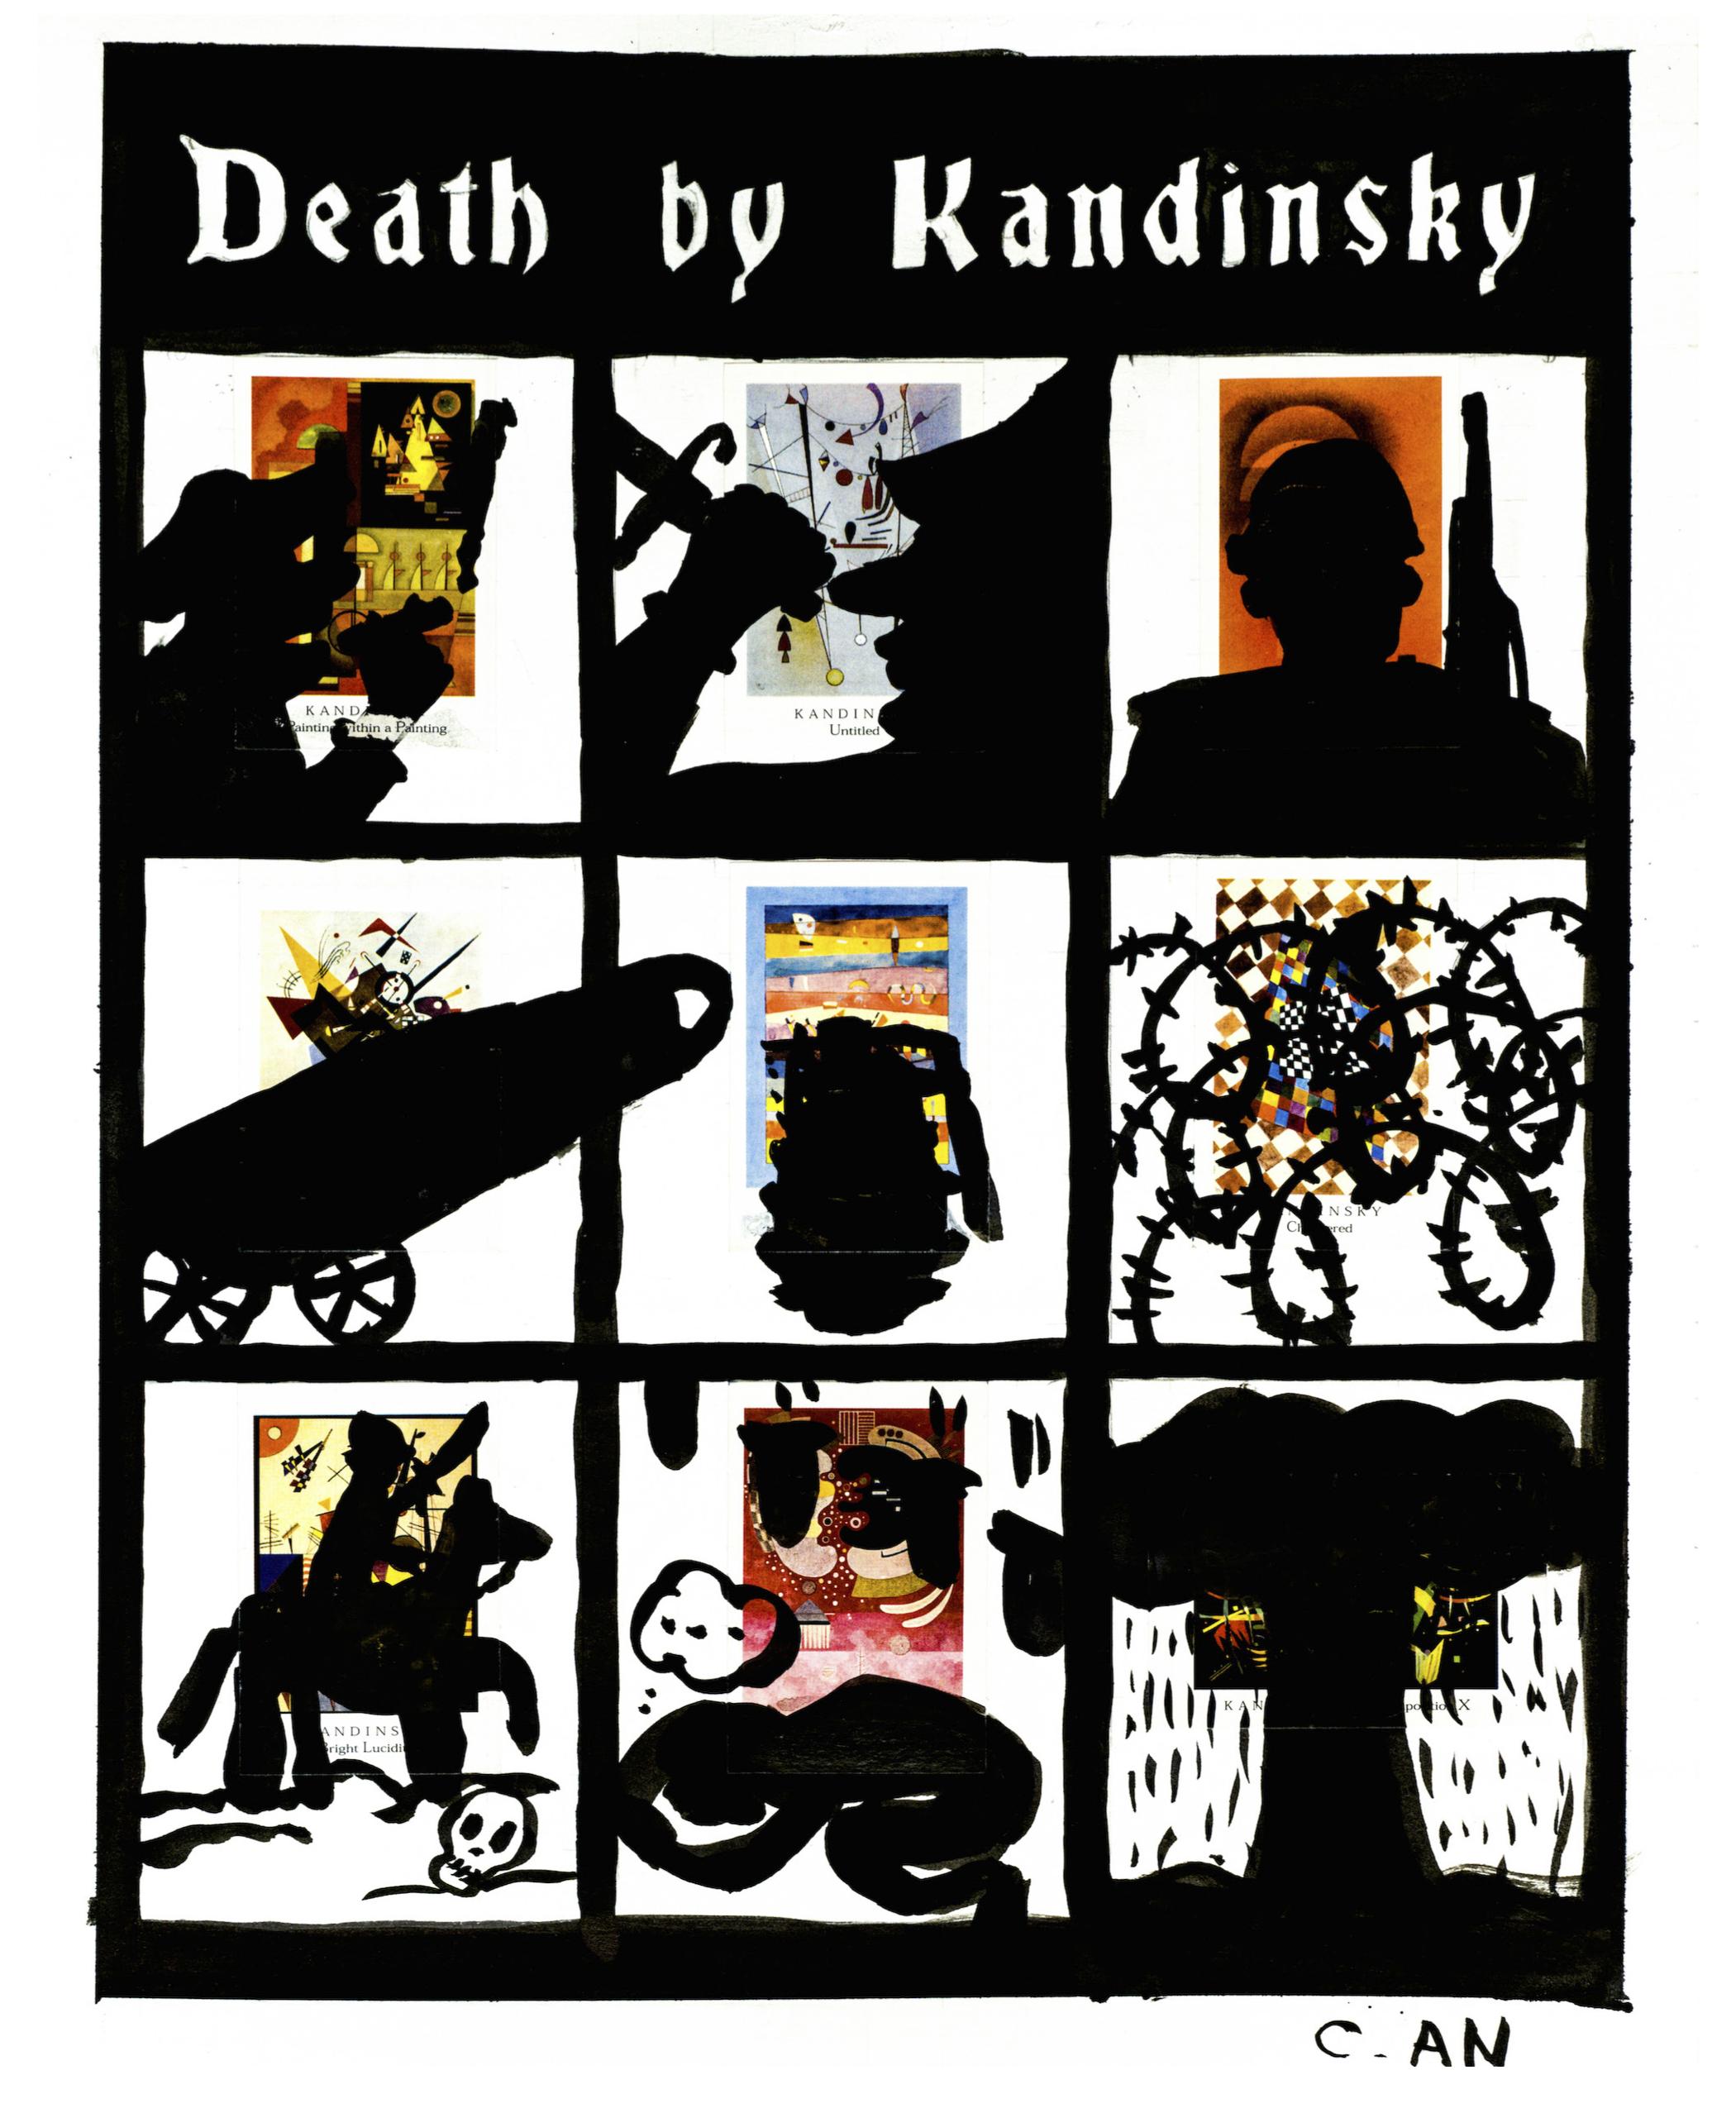 Death by Kandinsky